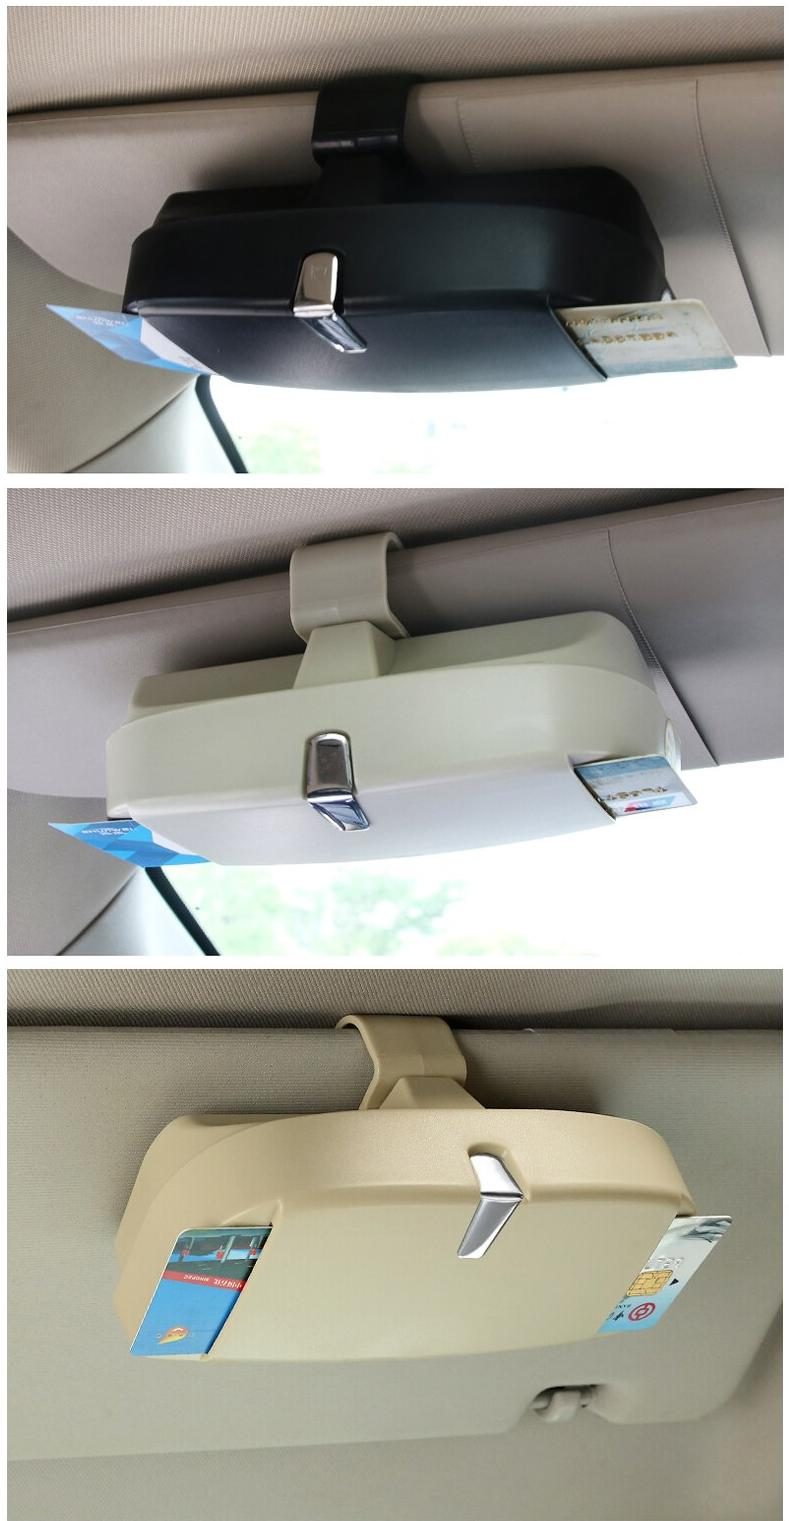 Car Sunglasses Holder Cars Glasses Storage For Sun Visor Mounting Sunshade Organizer Pocket Stowing Tidying Interior Accessories